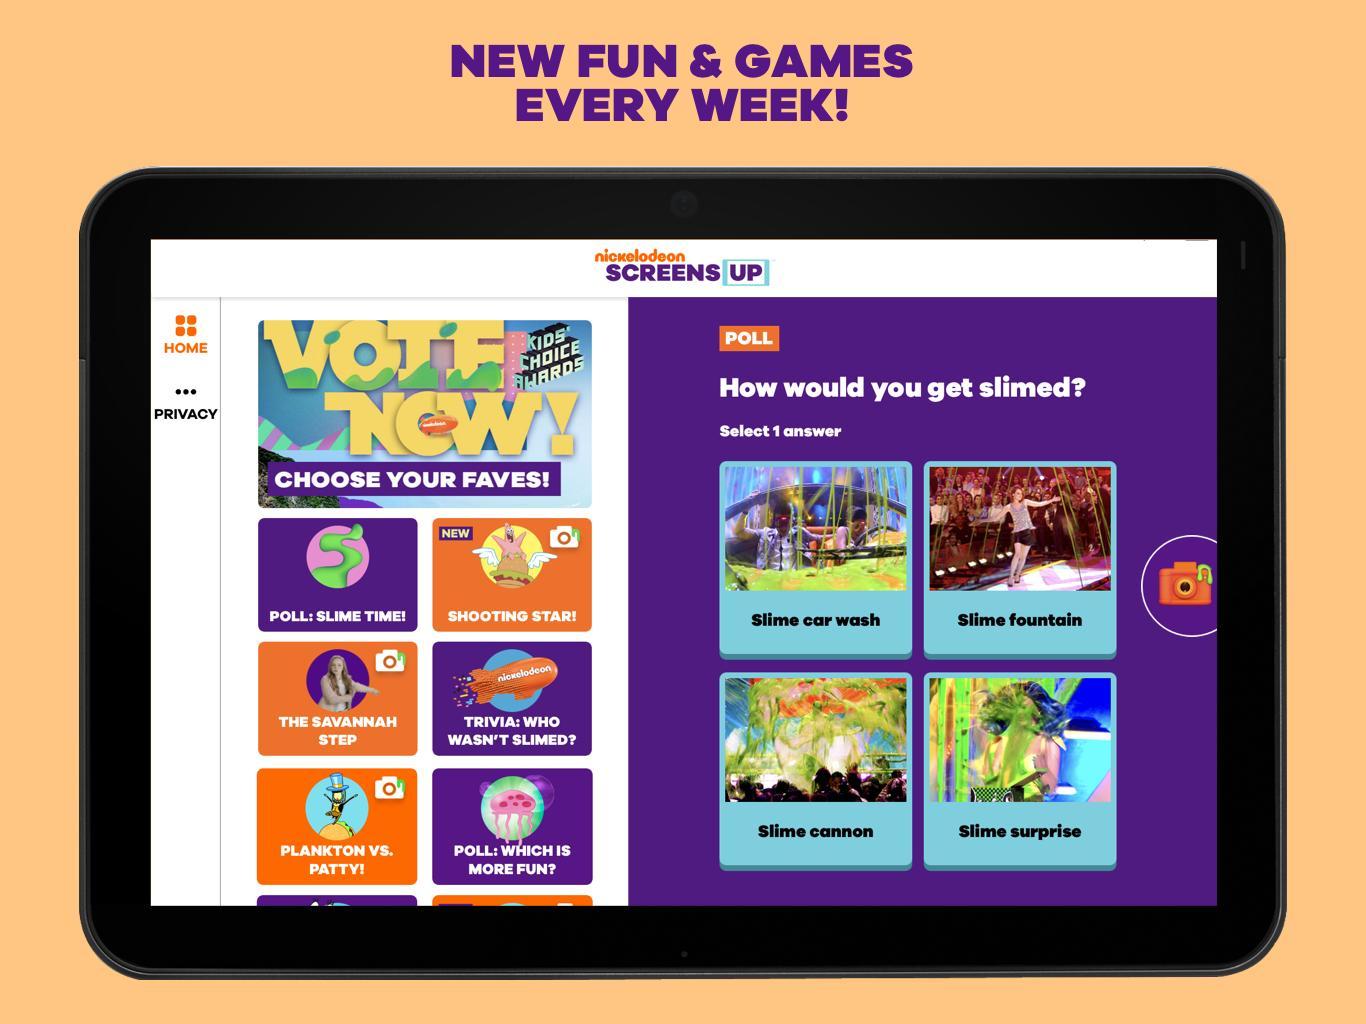 SCREENS UP by Nickelodeon 6.1.1763 Screenshot 9